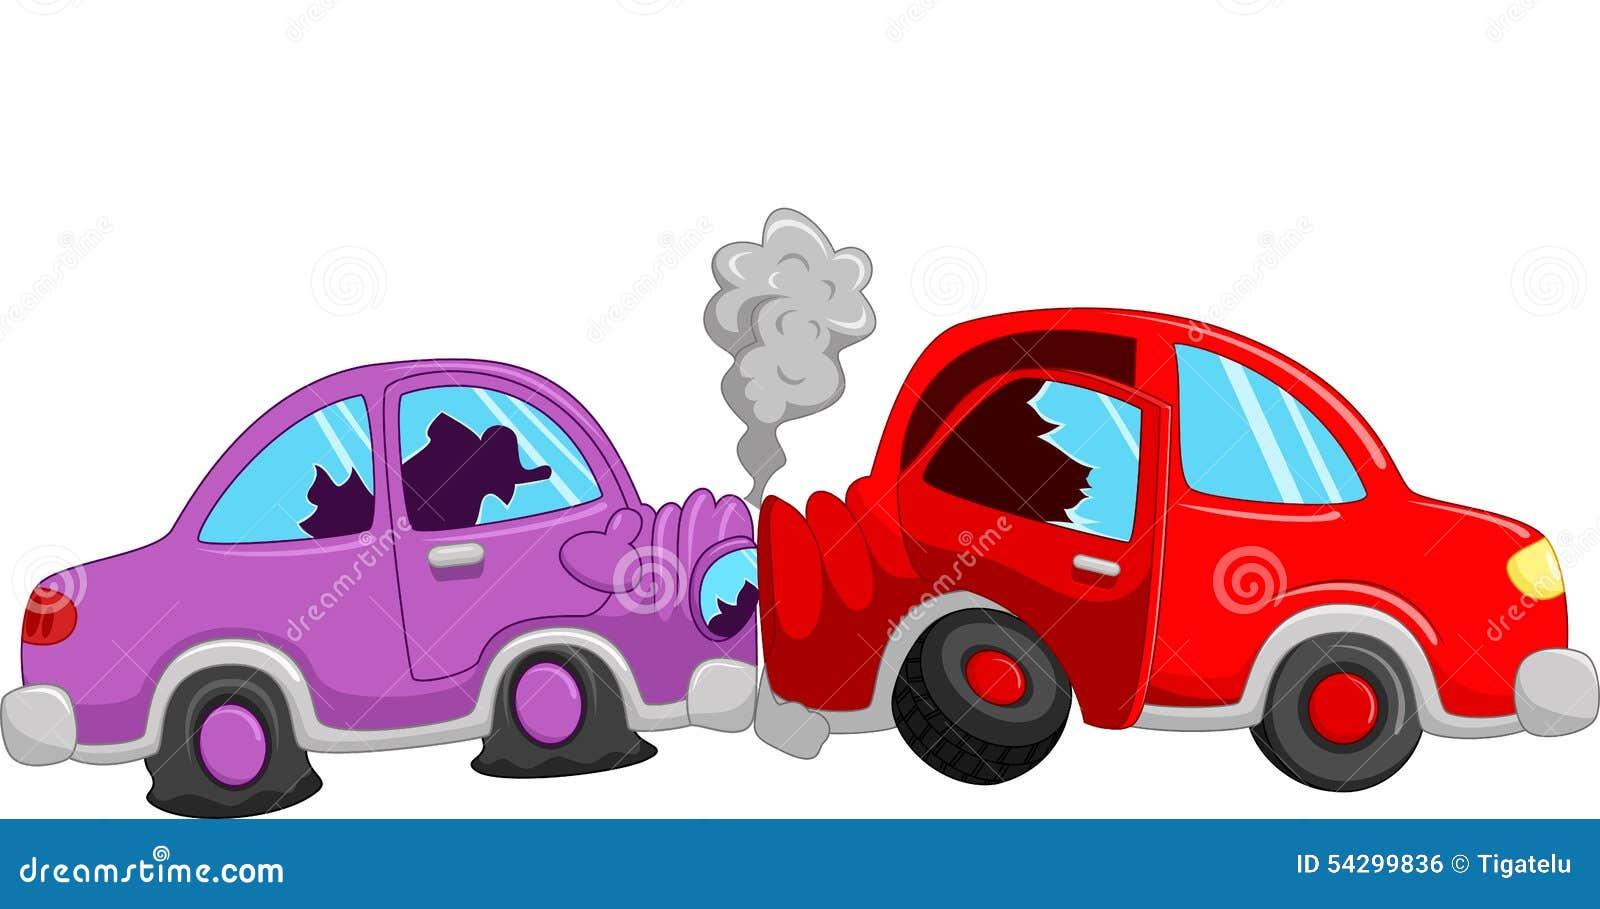 Cartoon Car Accident Stock Illustration - Image: 54299836